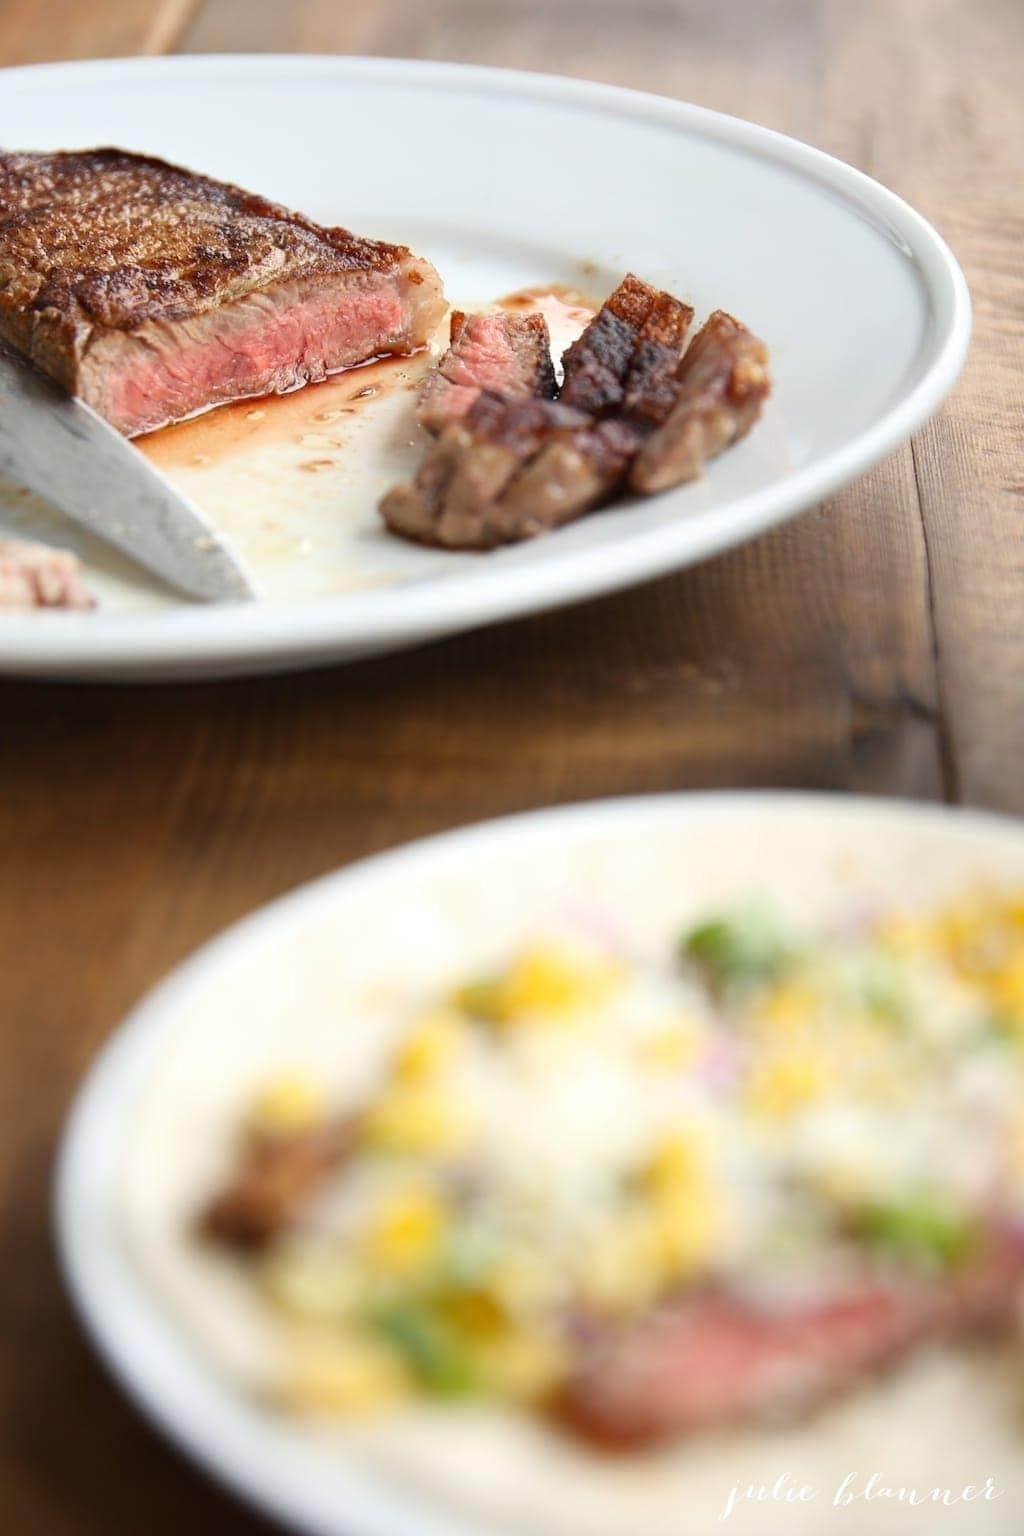 http://julieblanner.com/wp-content/uploads/2015/02/how-to-cook-steak-tacos.jpg